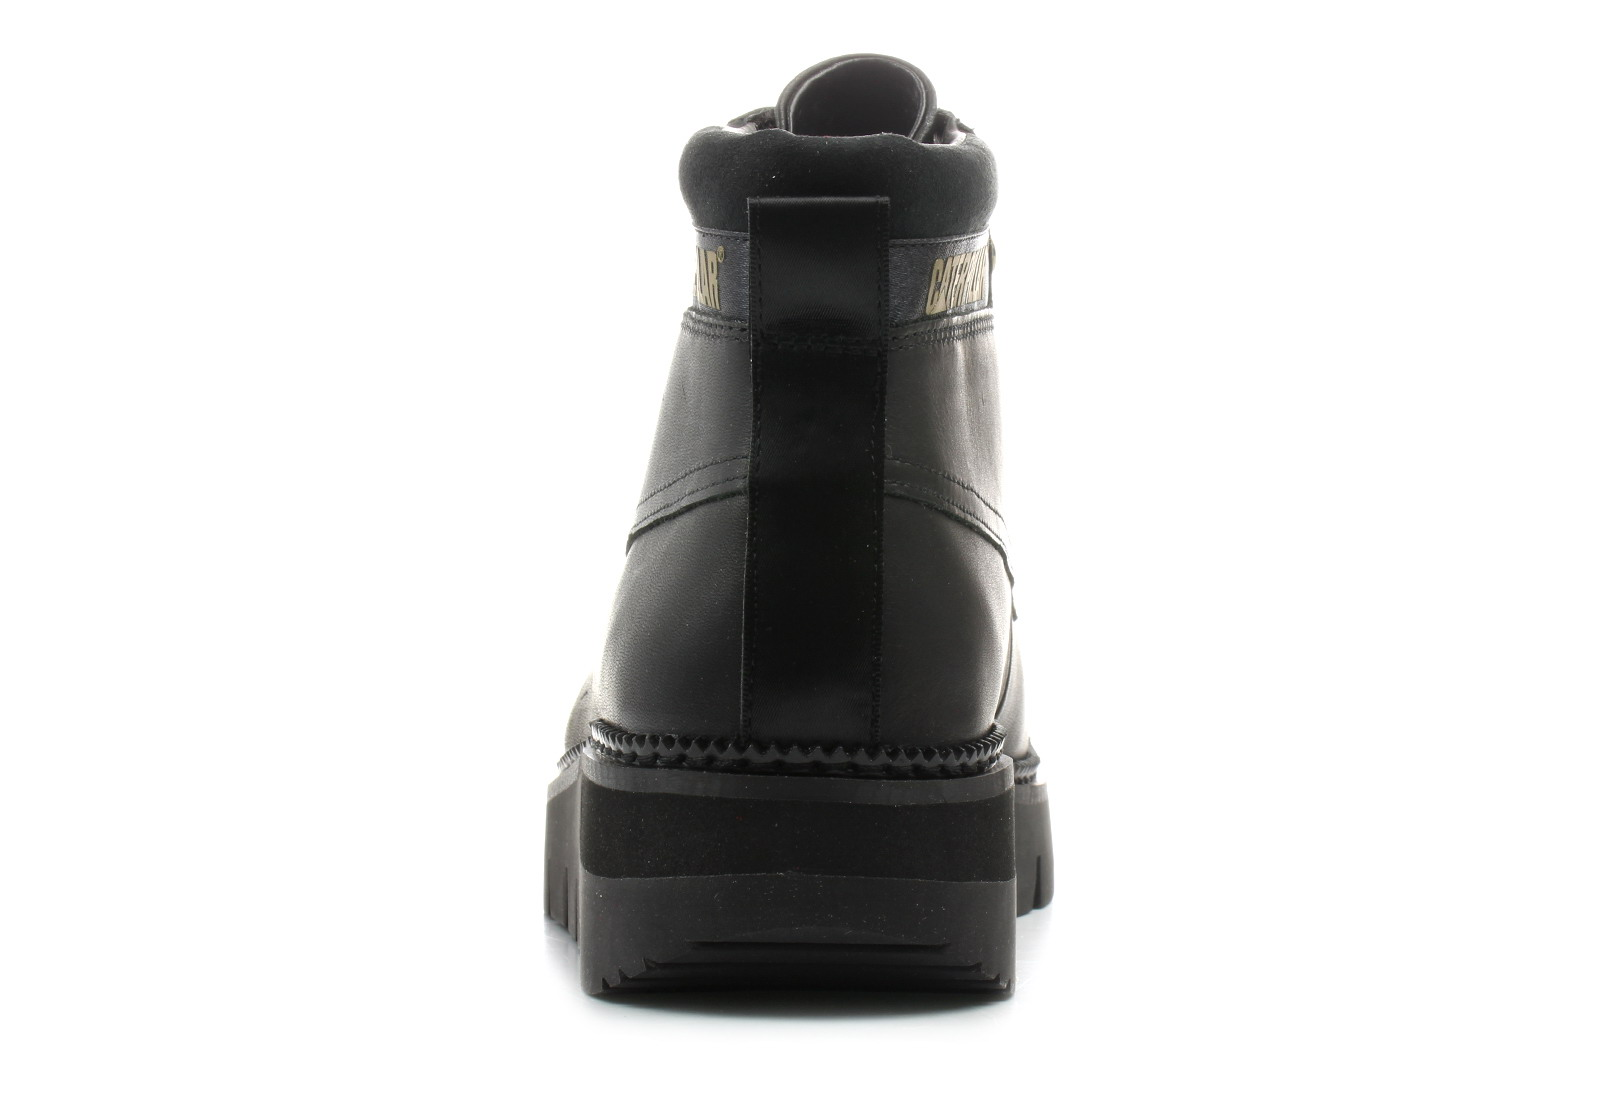 3b8bdd7717 Cat Boots - Pastime - 310243-blk - Online shop for sneakers, shoes ...